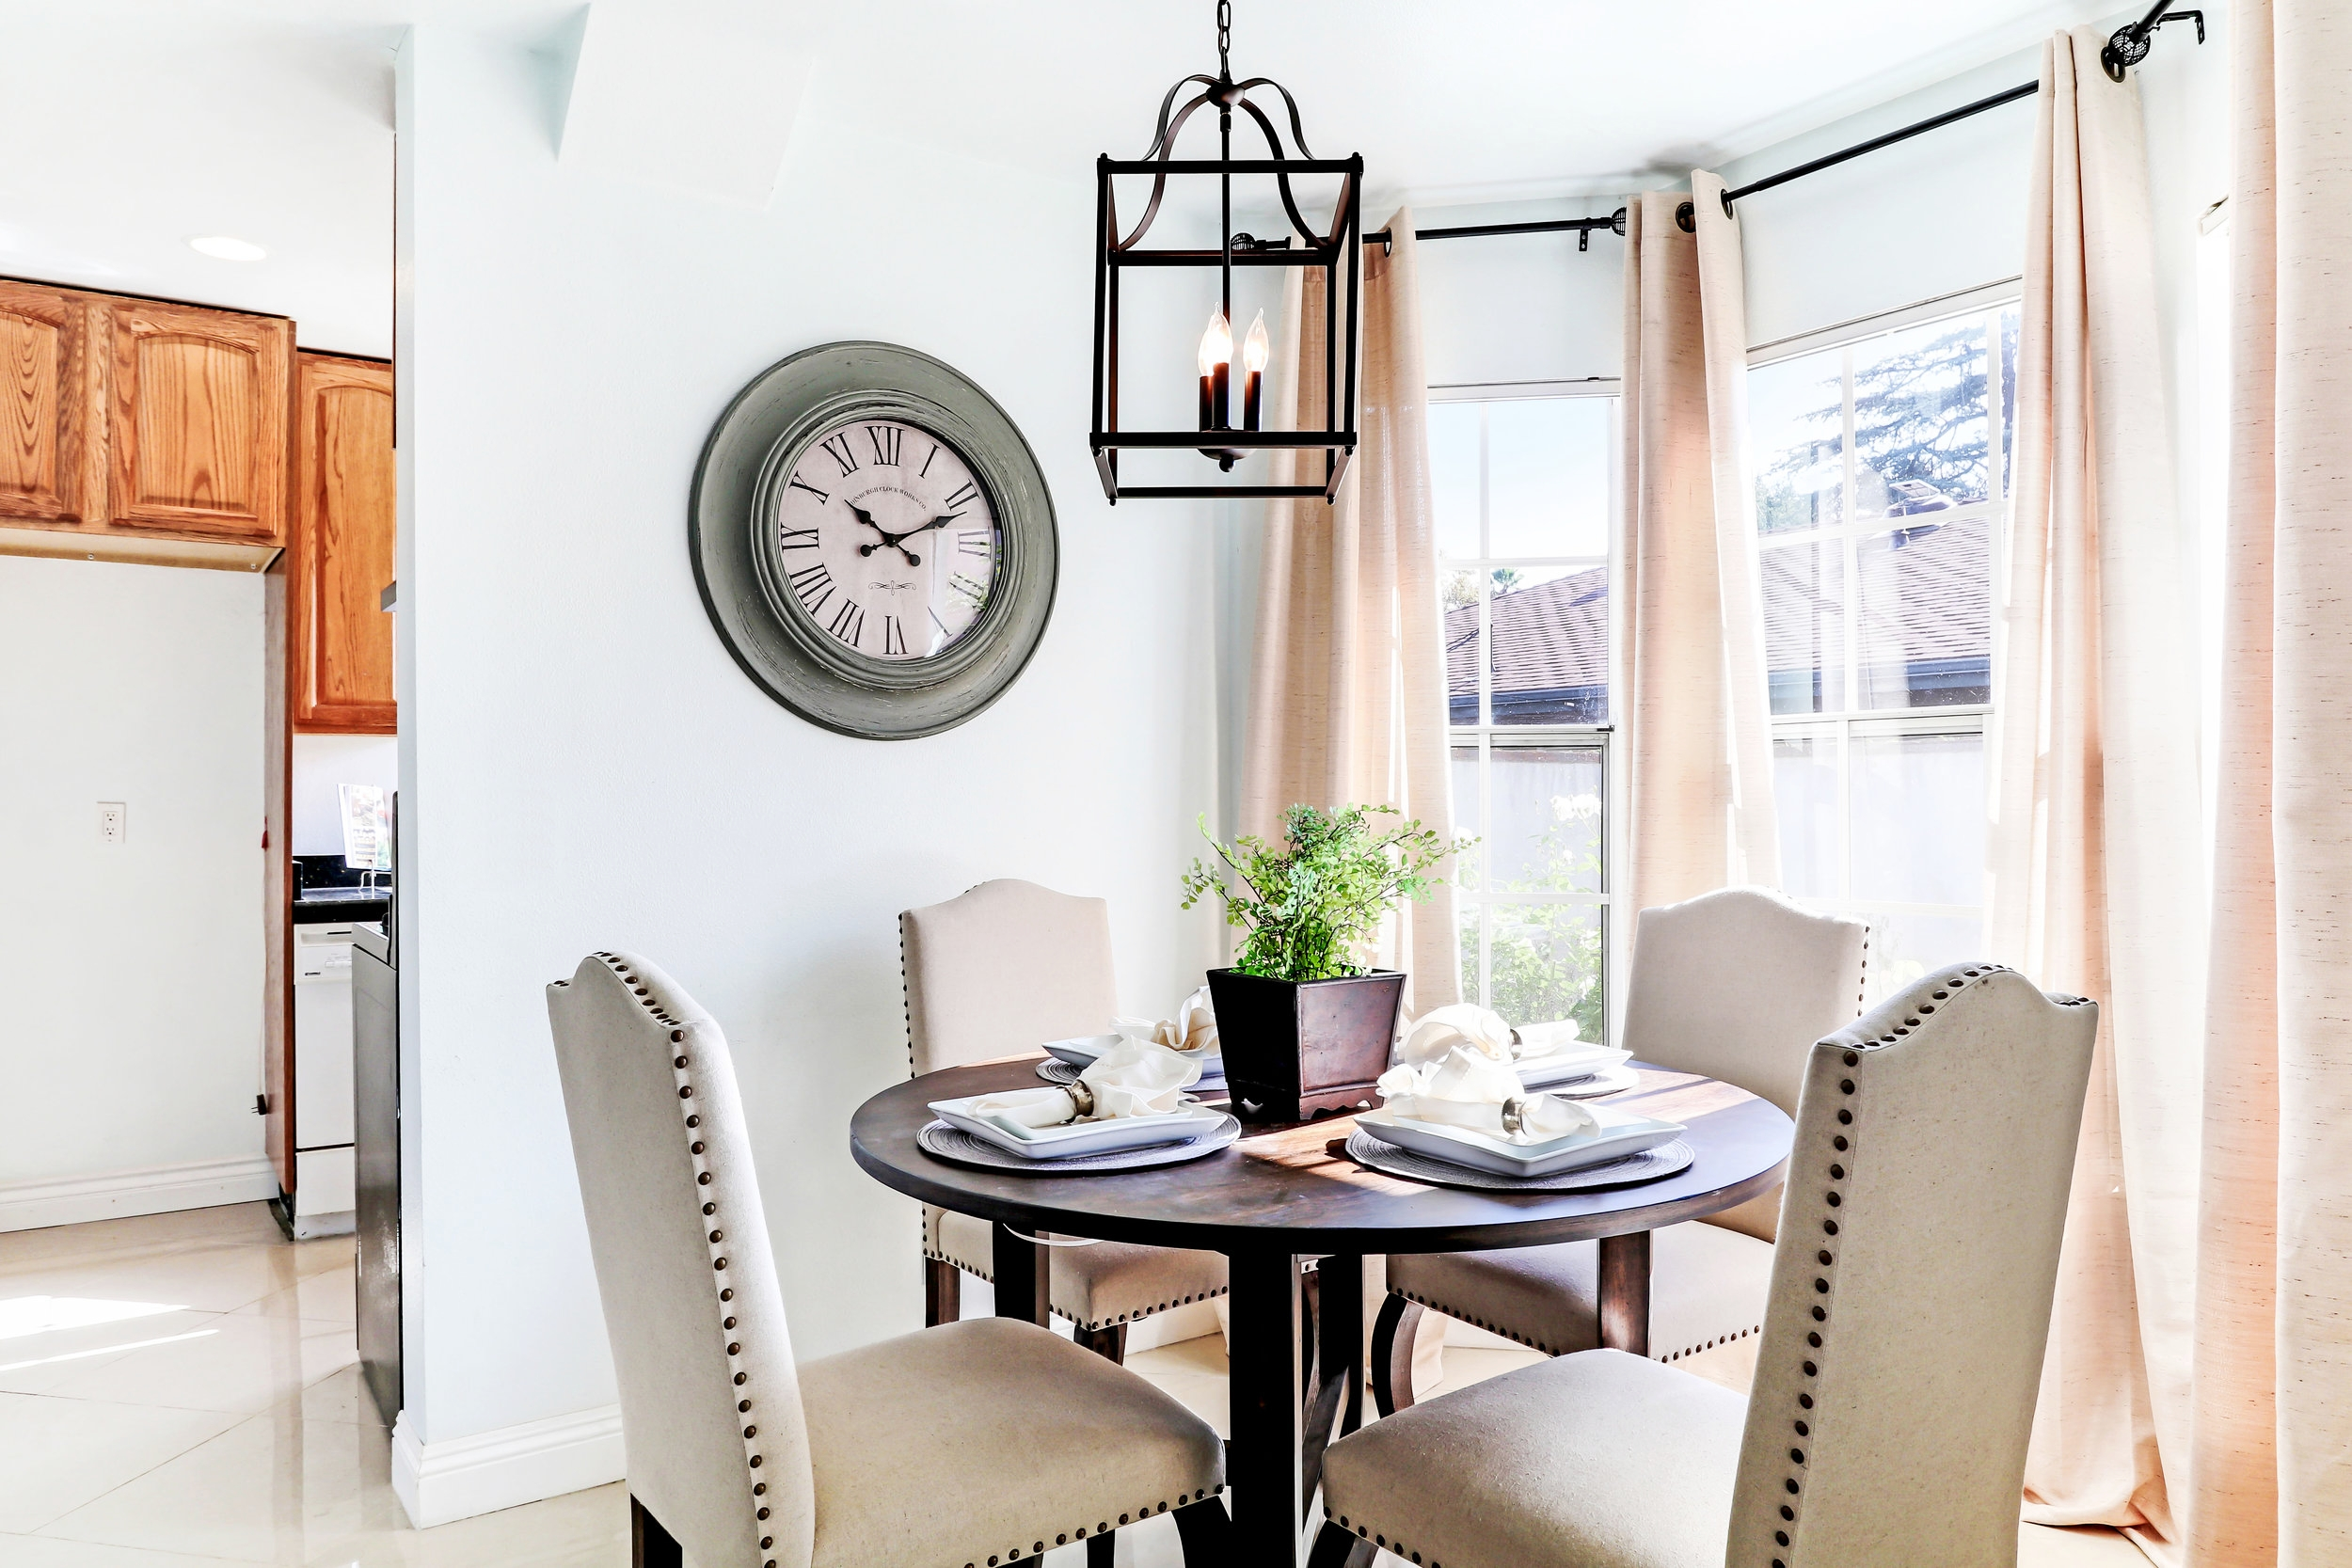 HighRes-Real-Estate-Photography-744 W Walnut Ave-Monrovia-2419b.jpg